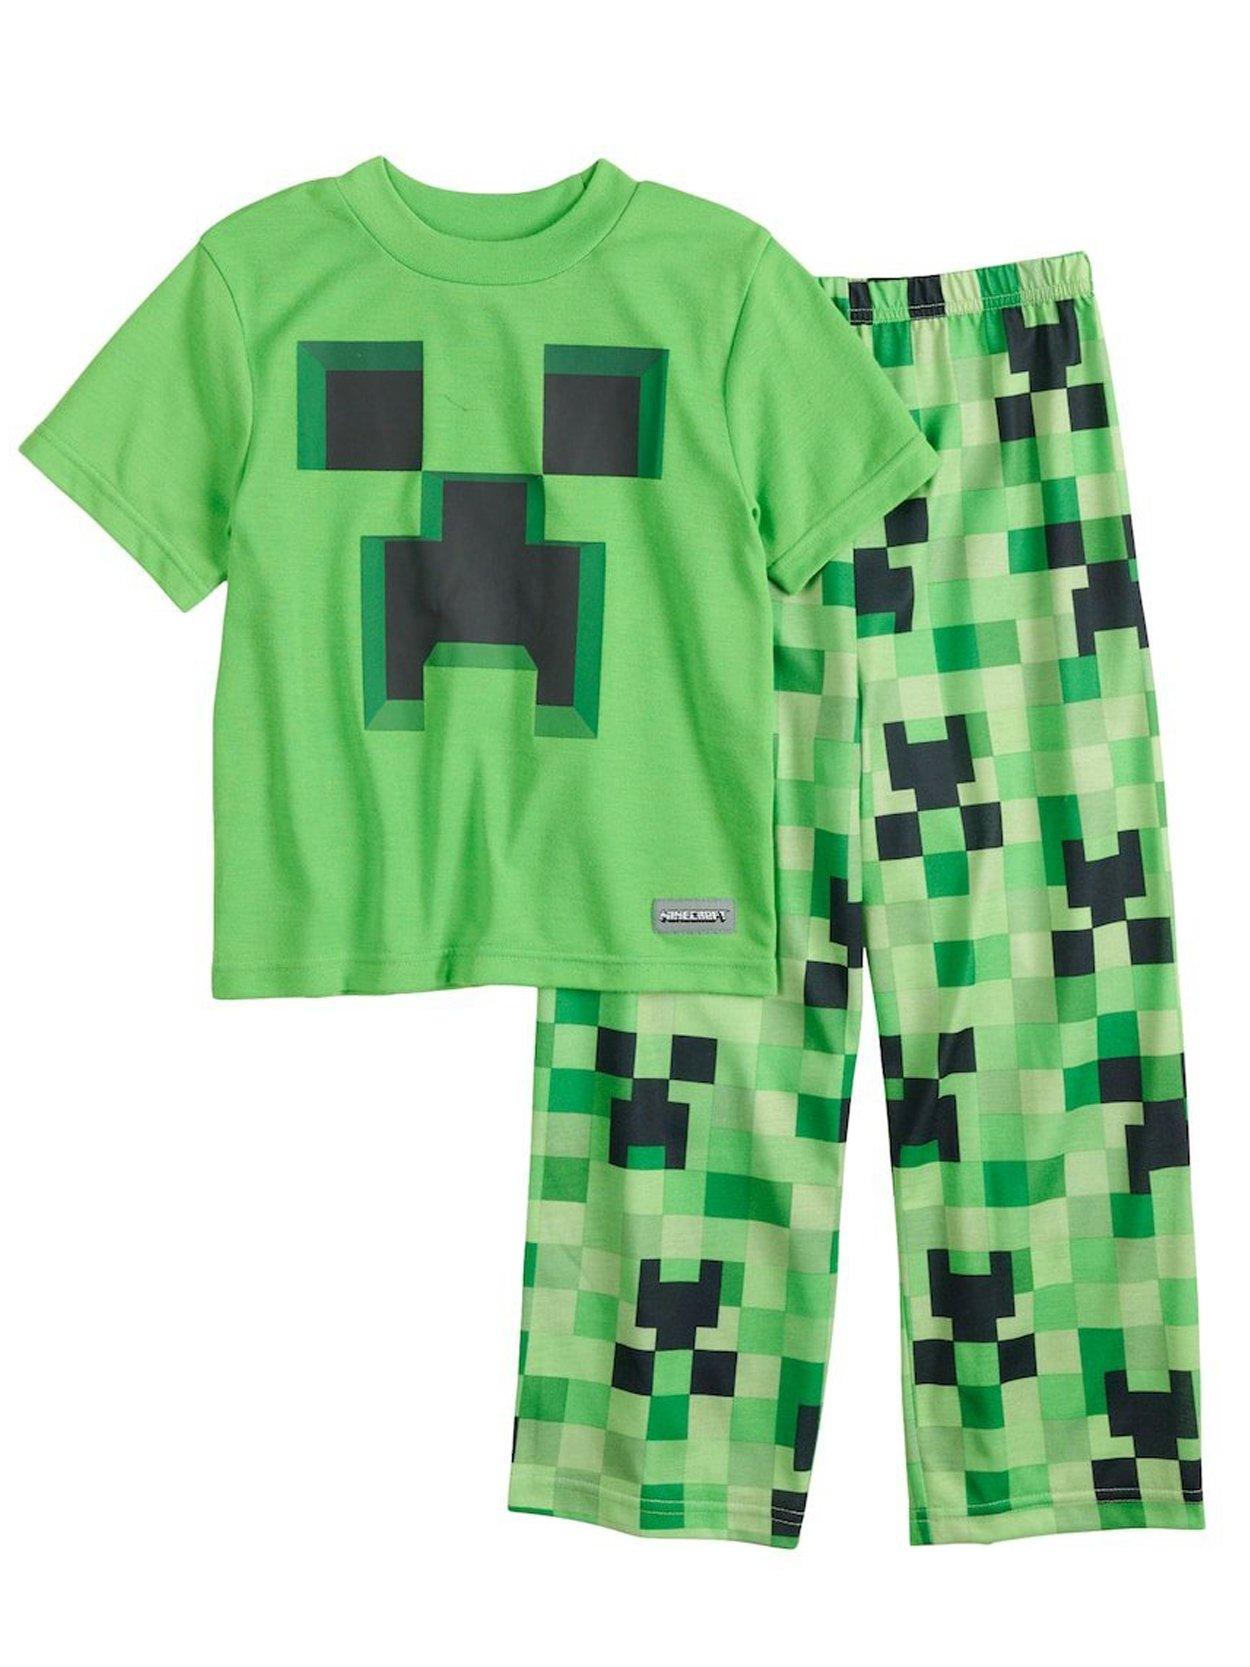 AME Minecraft Creeper Pajamas for Big Boys (10)